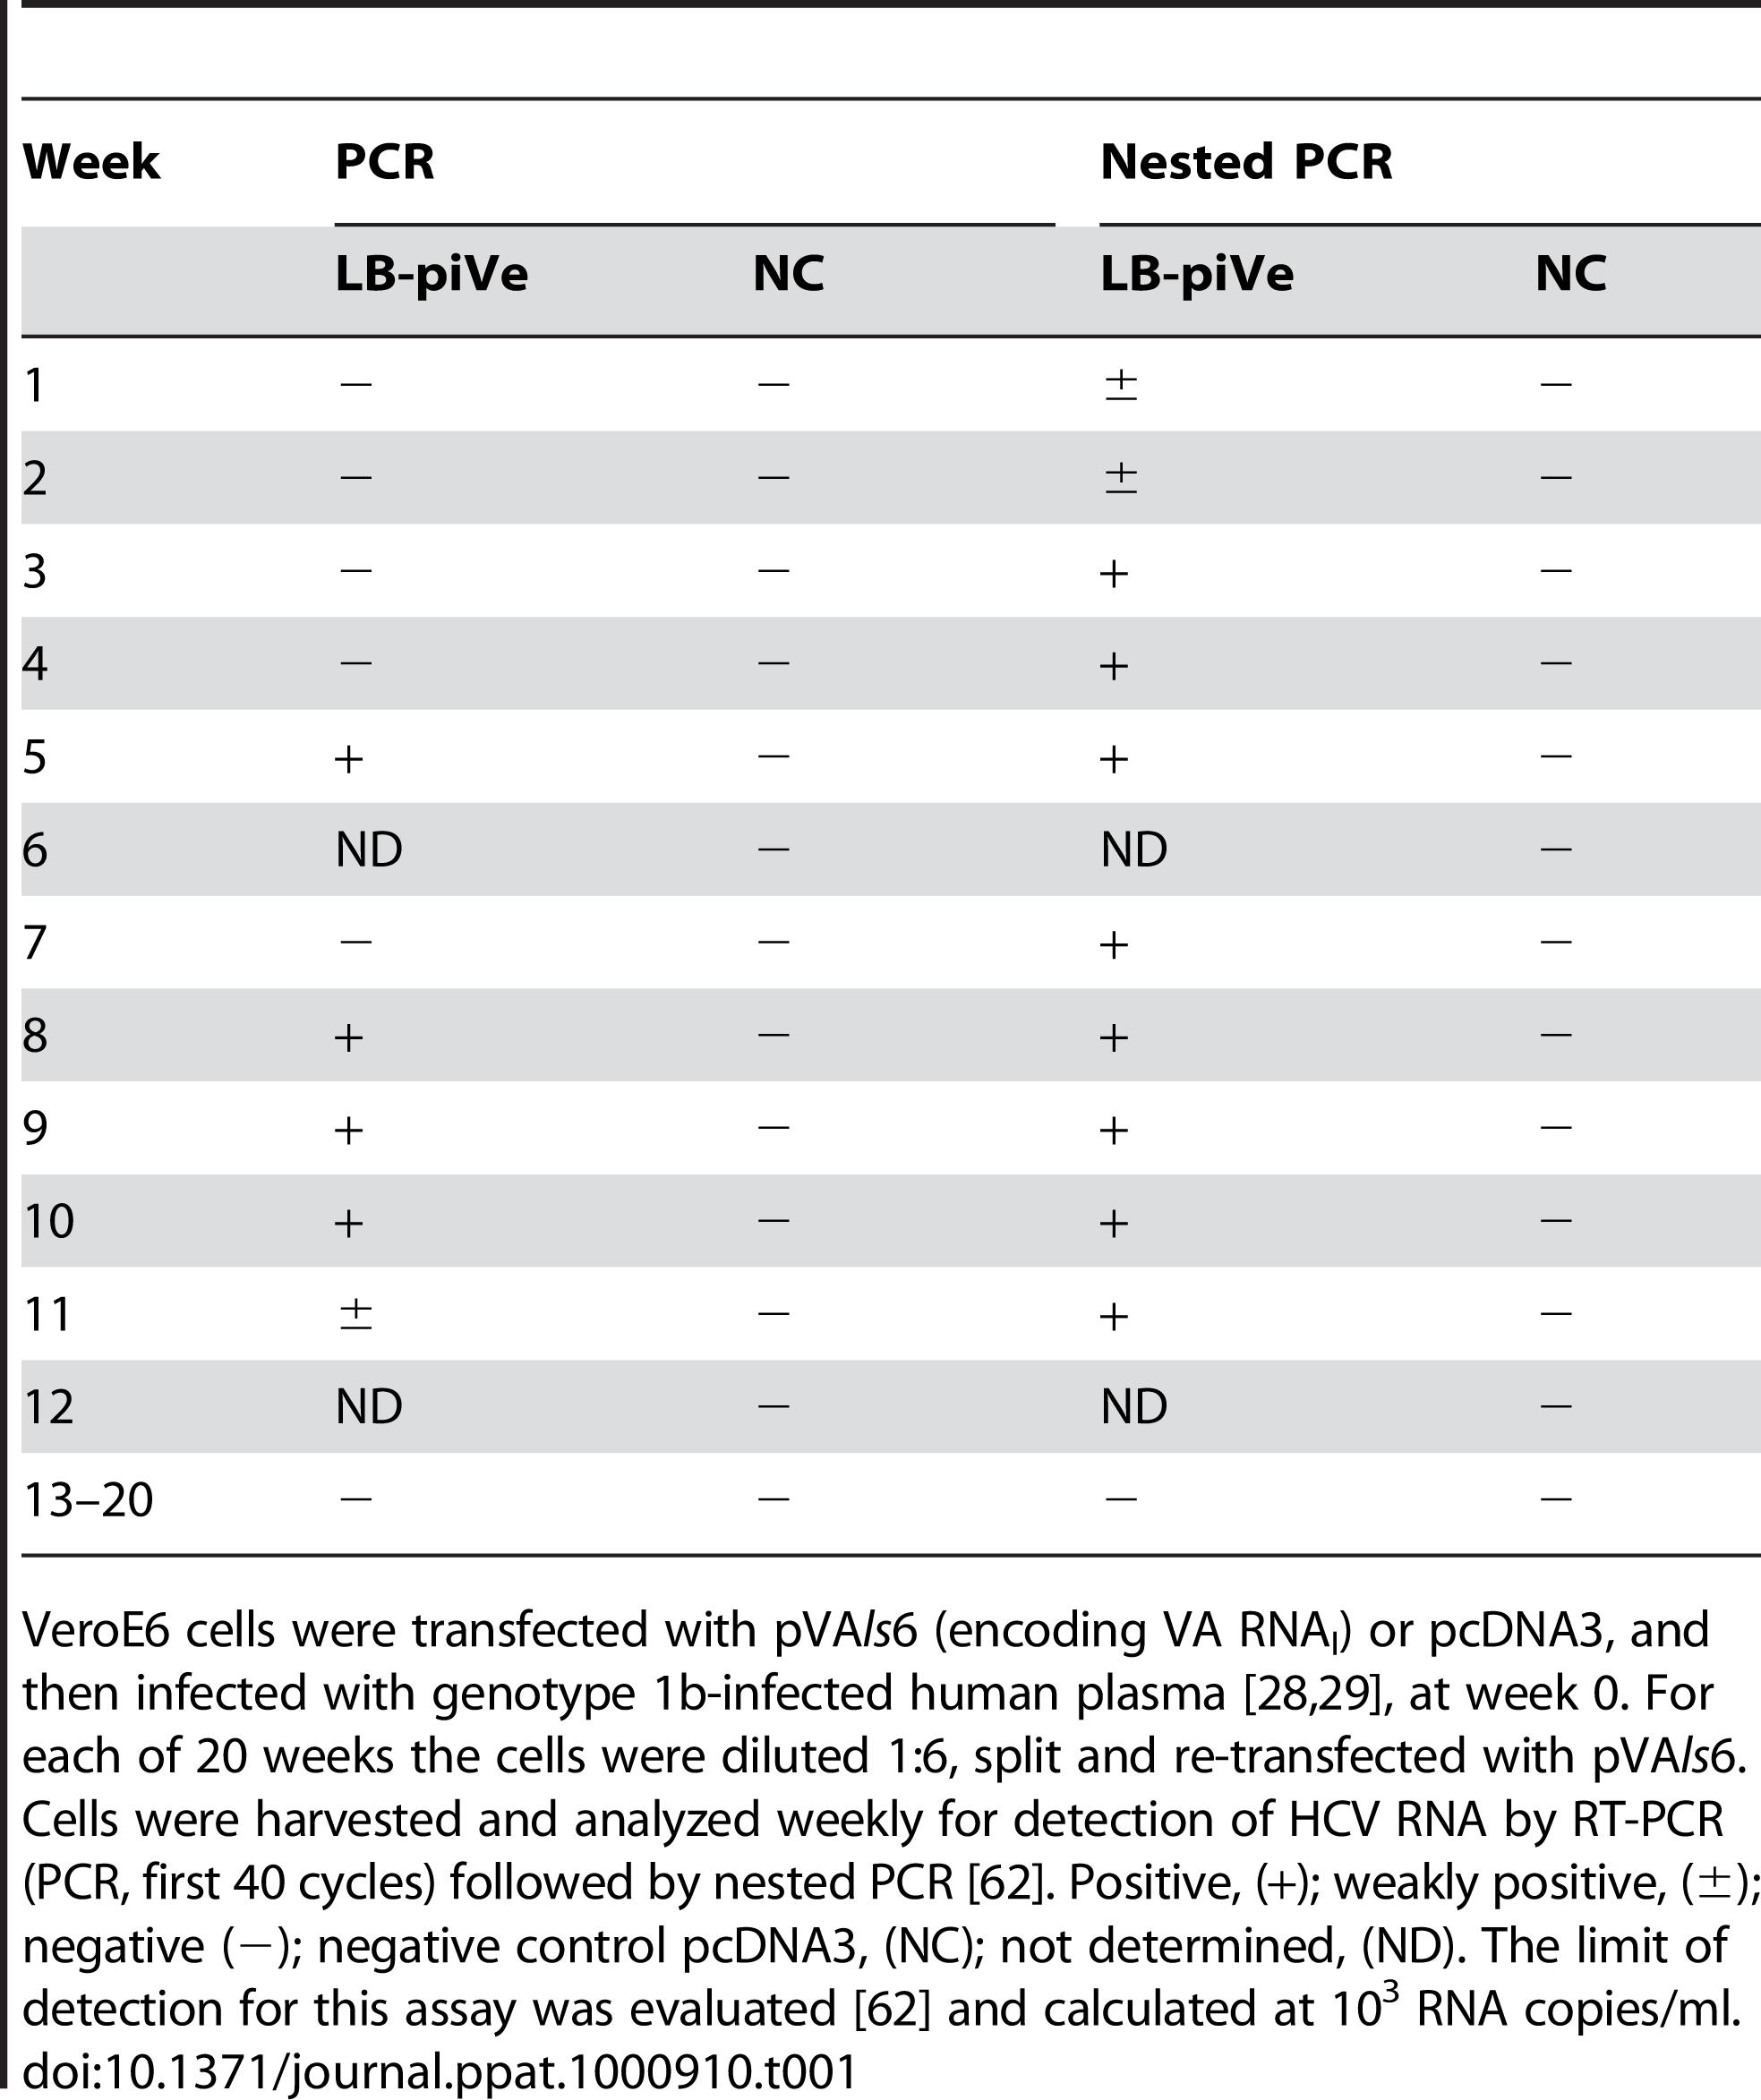 HCV persistent infection in VeroE6 cells.